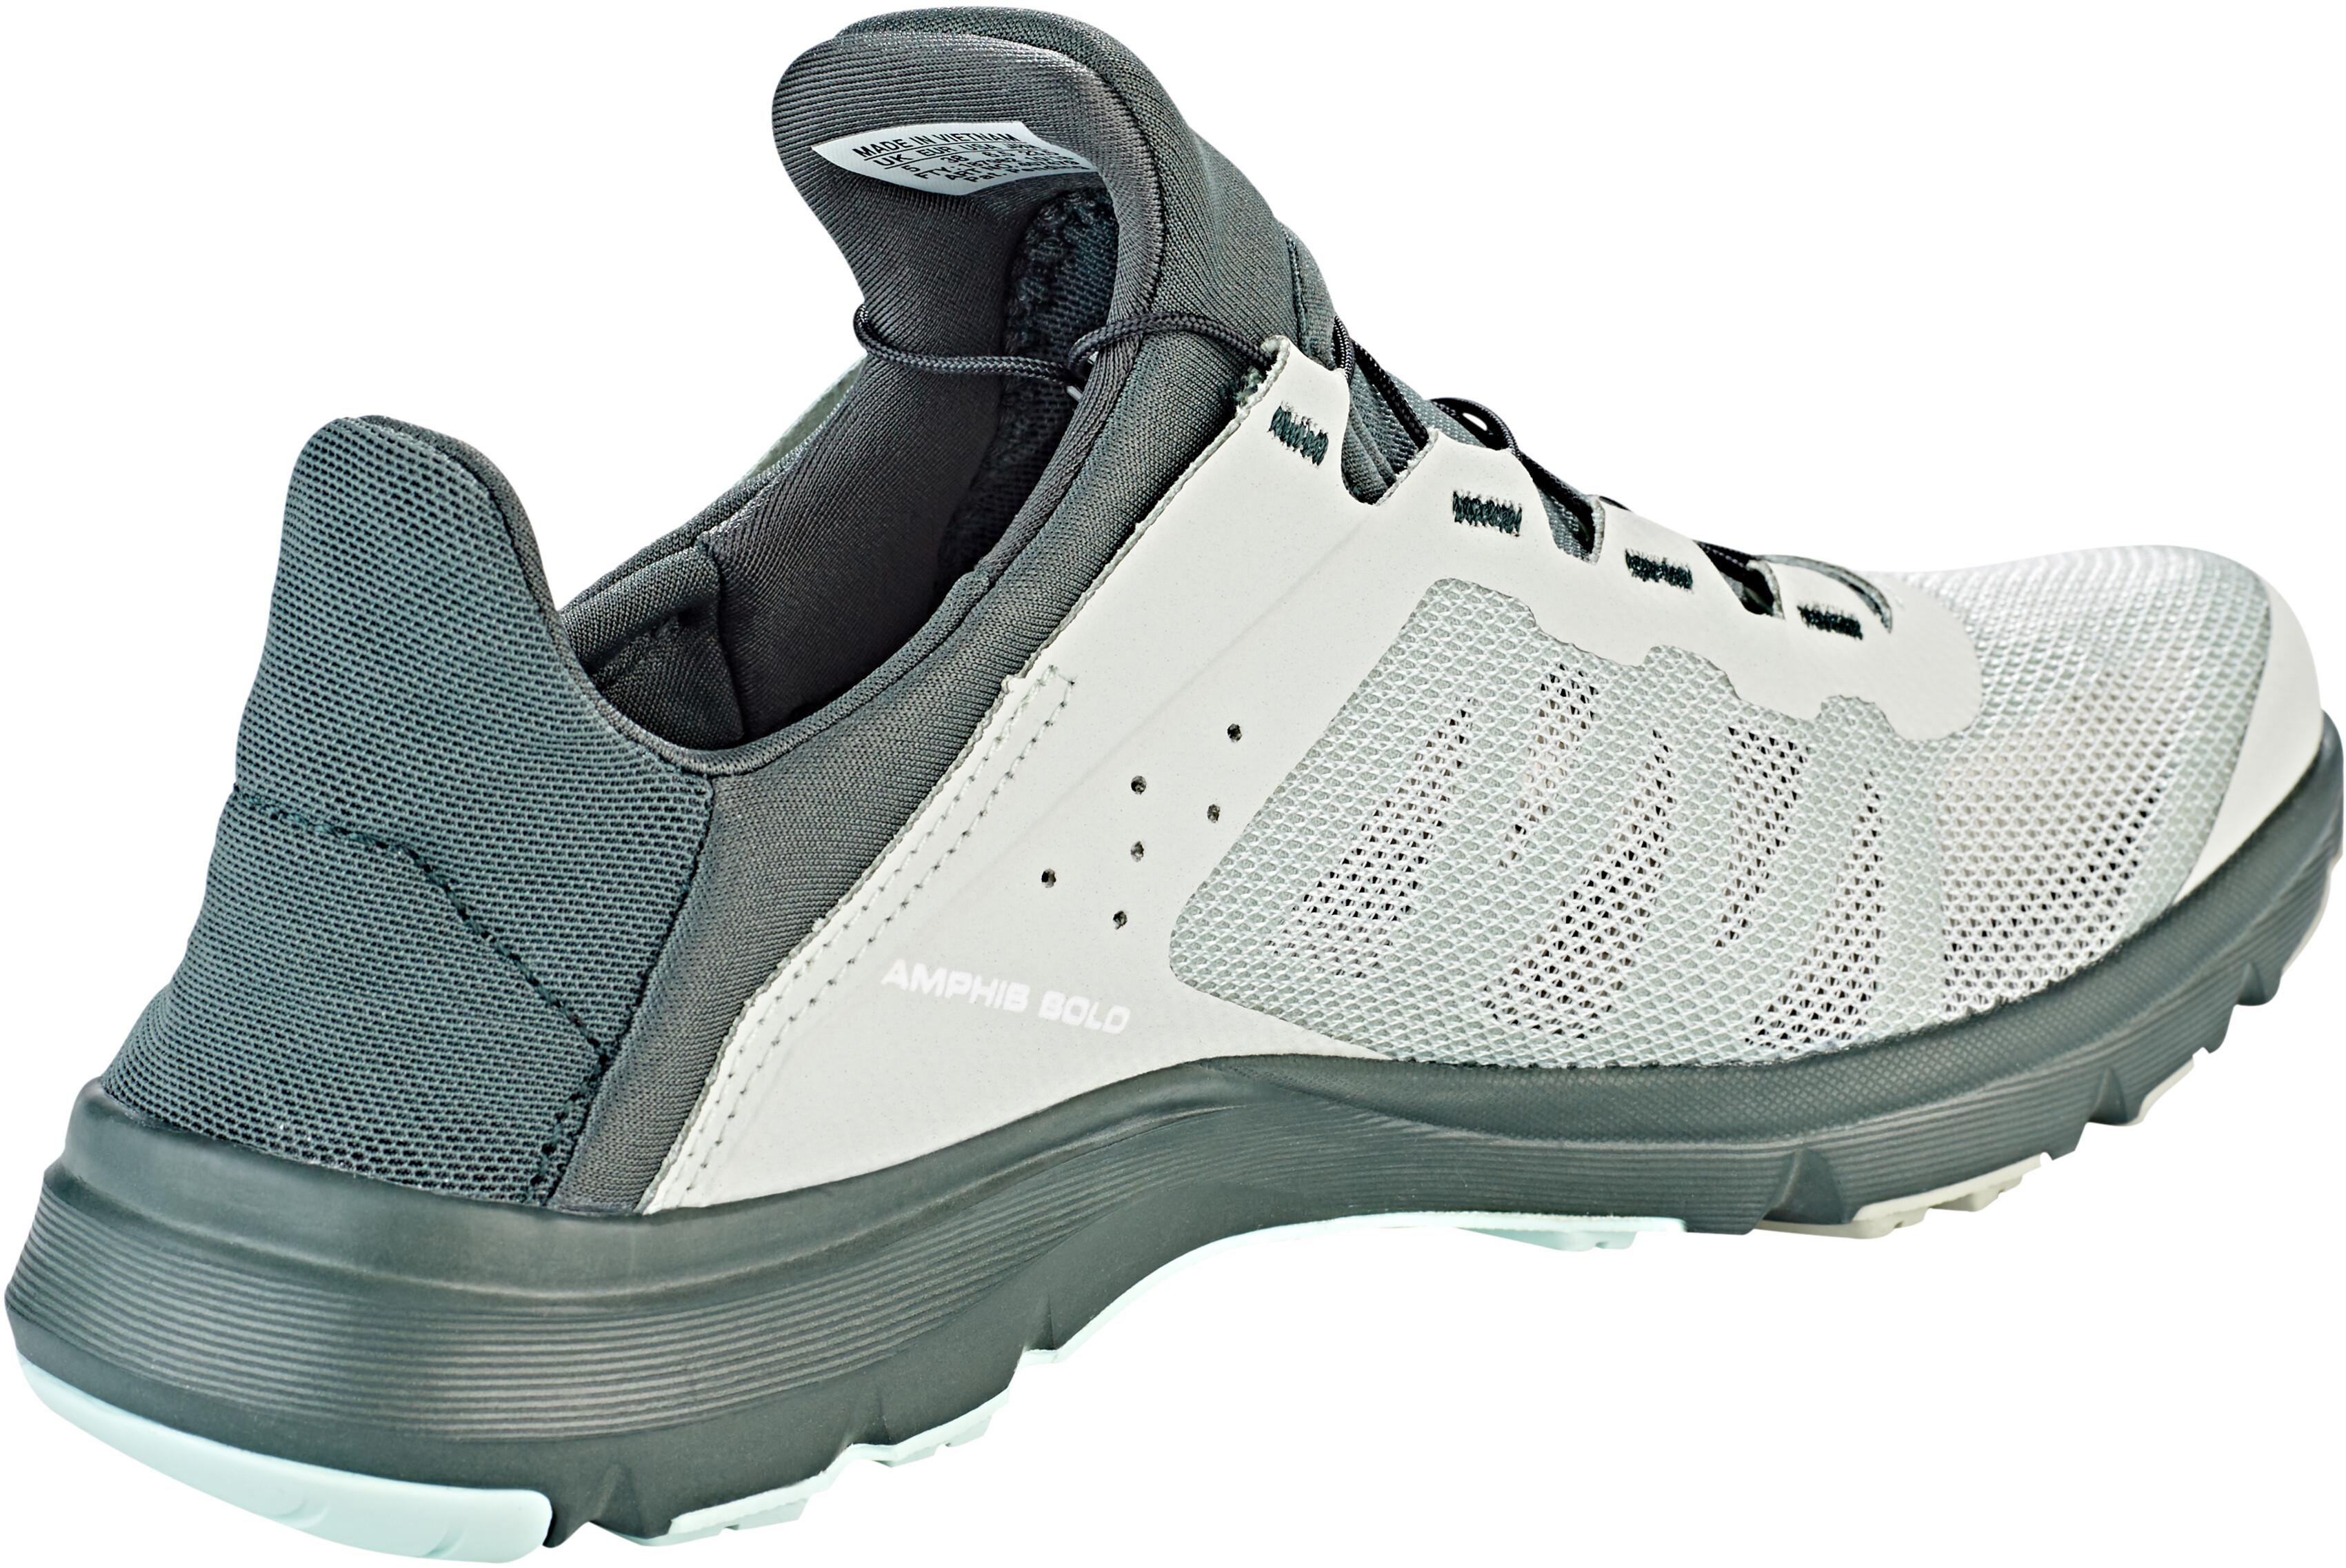 f0be15318bd Salomon Amphib Bold Shoes Women grey/black at Addnature.co.uk